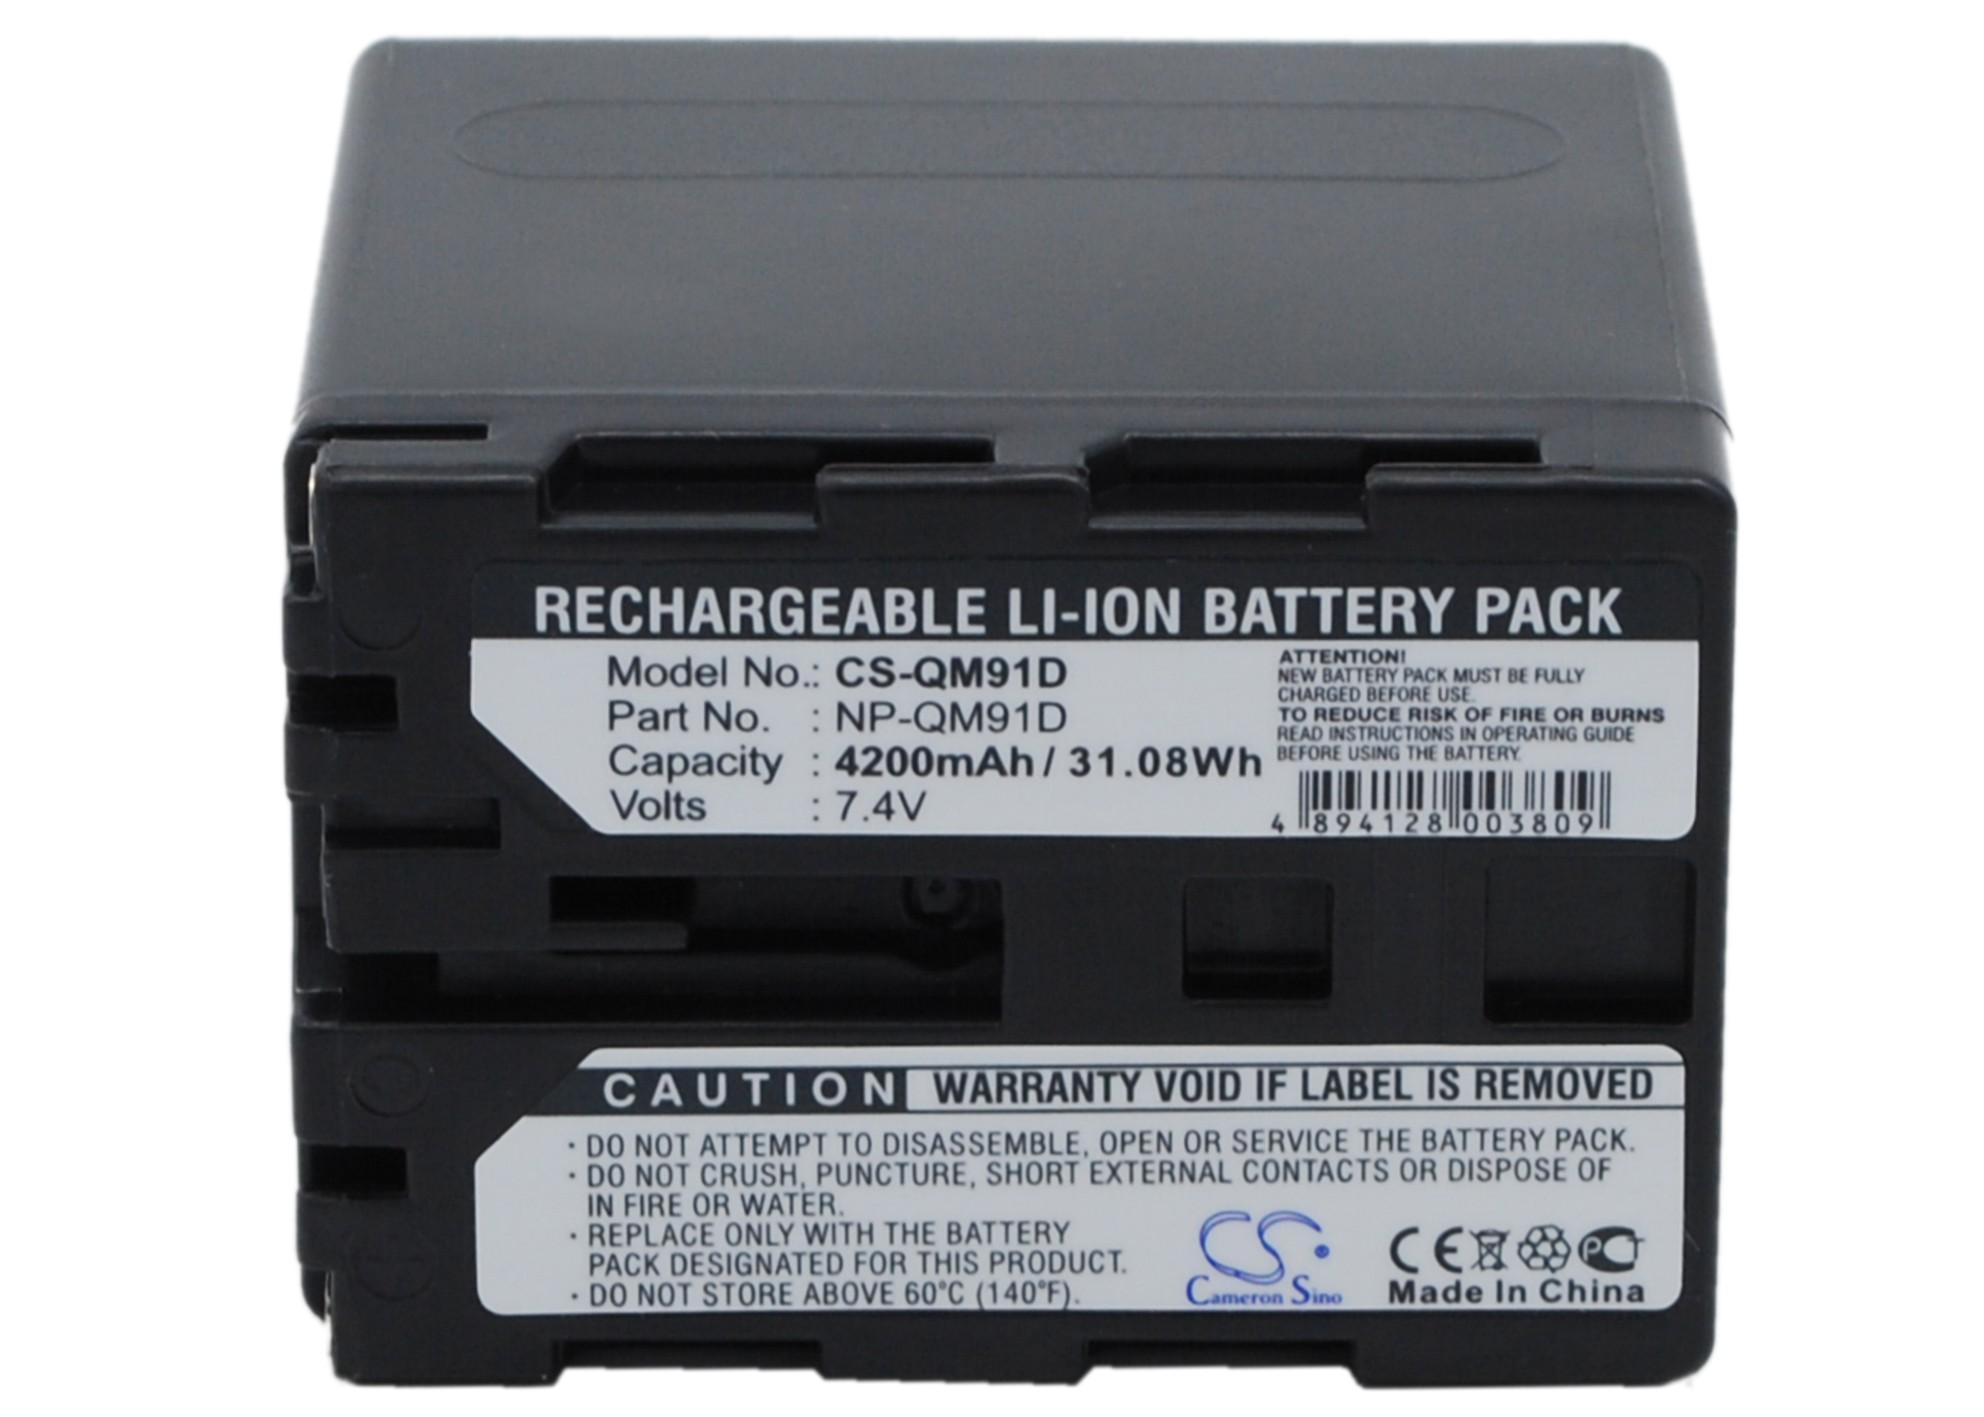 Cameron Sino baterie do kamer a fotoaparátů pro SONY DCR-TRV460E 7.4V Li-ion 4200mAh tmavě šedá - neoriginální